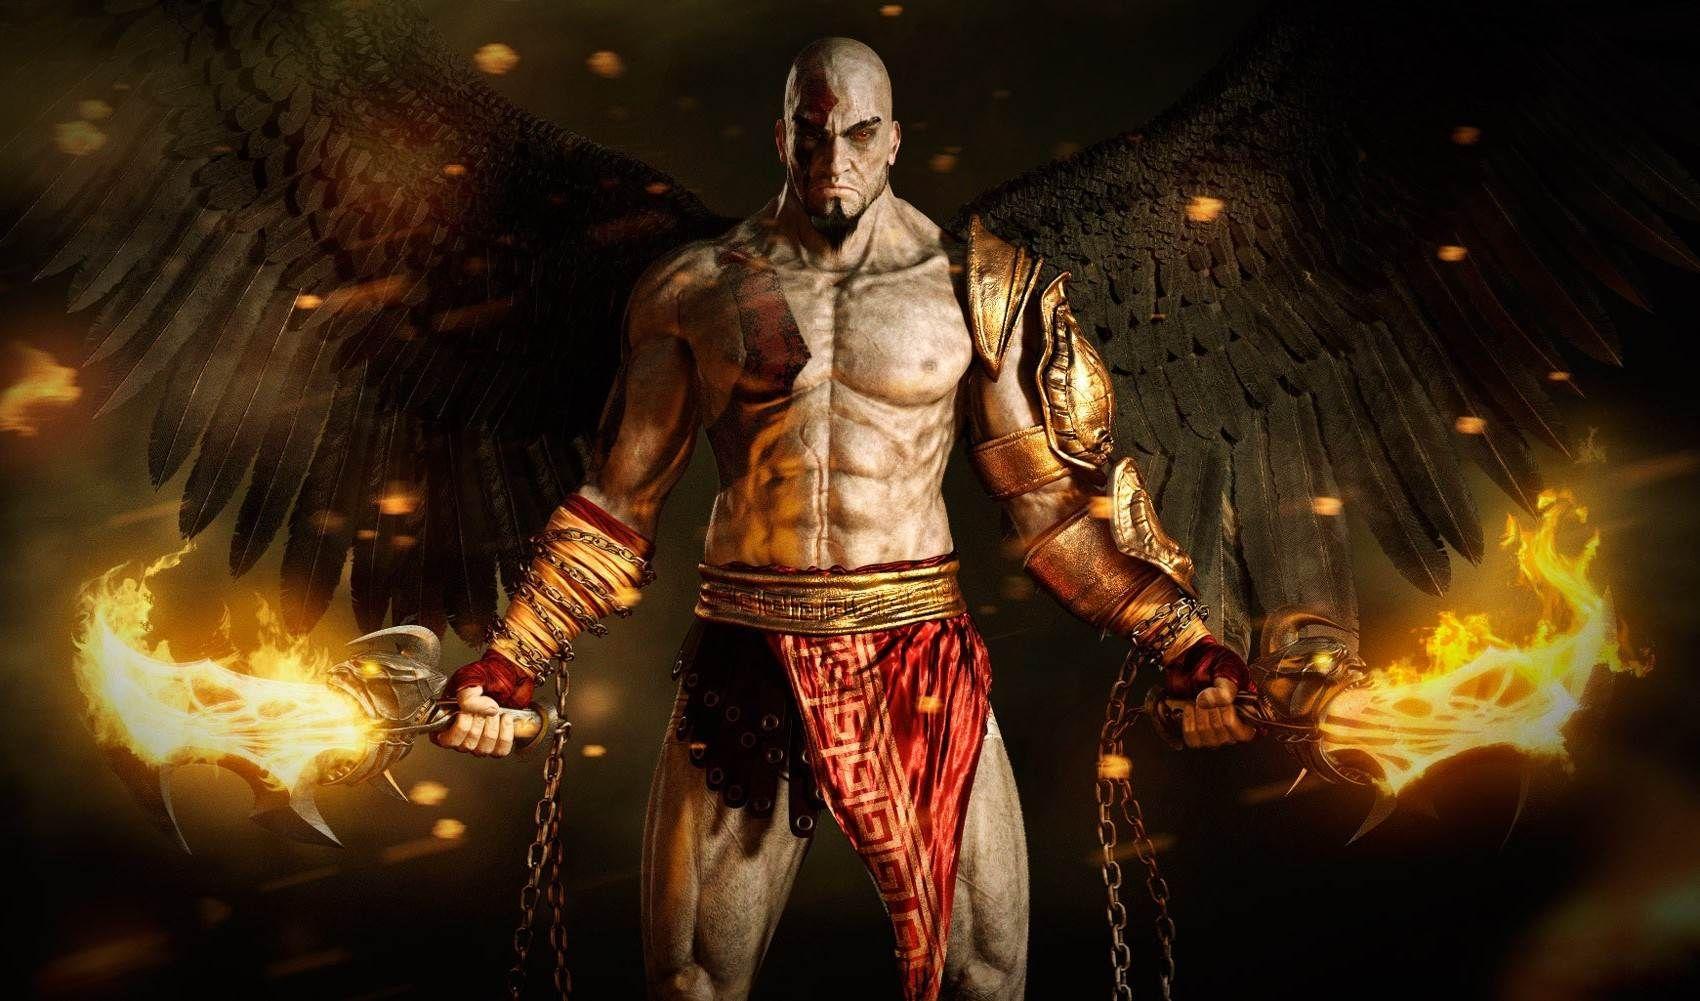 Ultra Hd K Kratos Wallpapers Hd Desktop Backgrounds 1700 1001 Kratos Hd Wallpapers Adorable Wallpapers Kratos God Of War God Of War God Of War Series